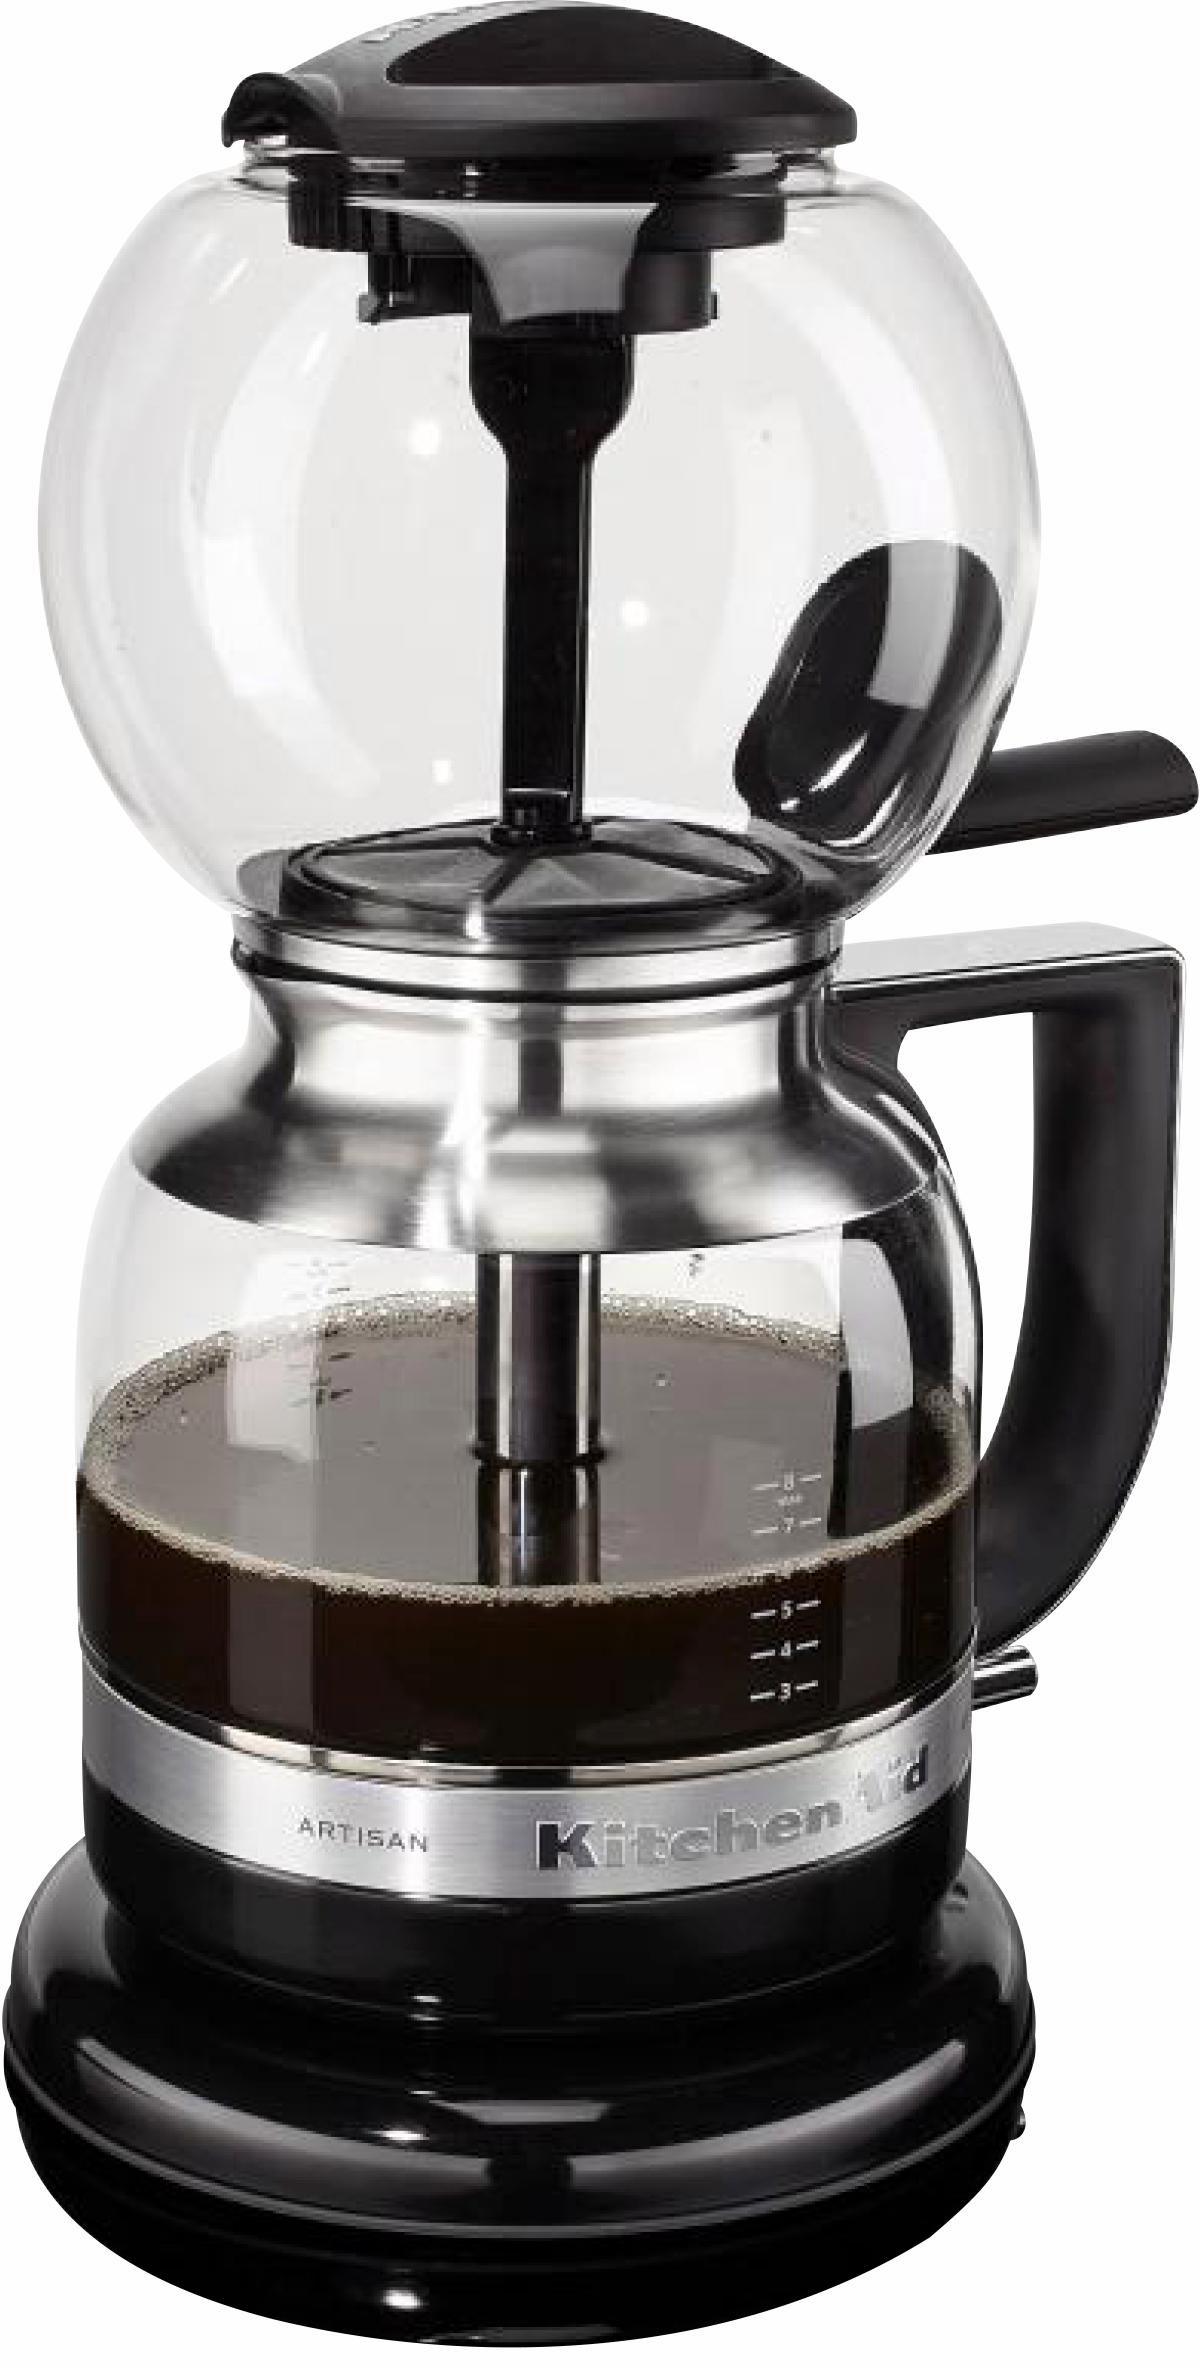 KitchenAid Siphon-Kaffeebrüher Artisan 5KCM0812, 1l Kaffeekanne, Permanentfilter